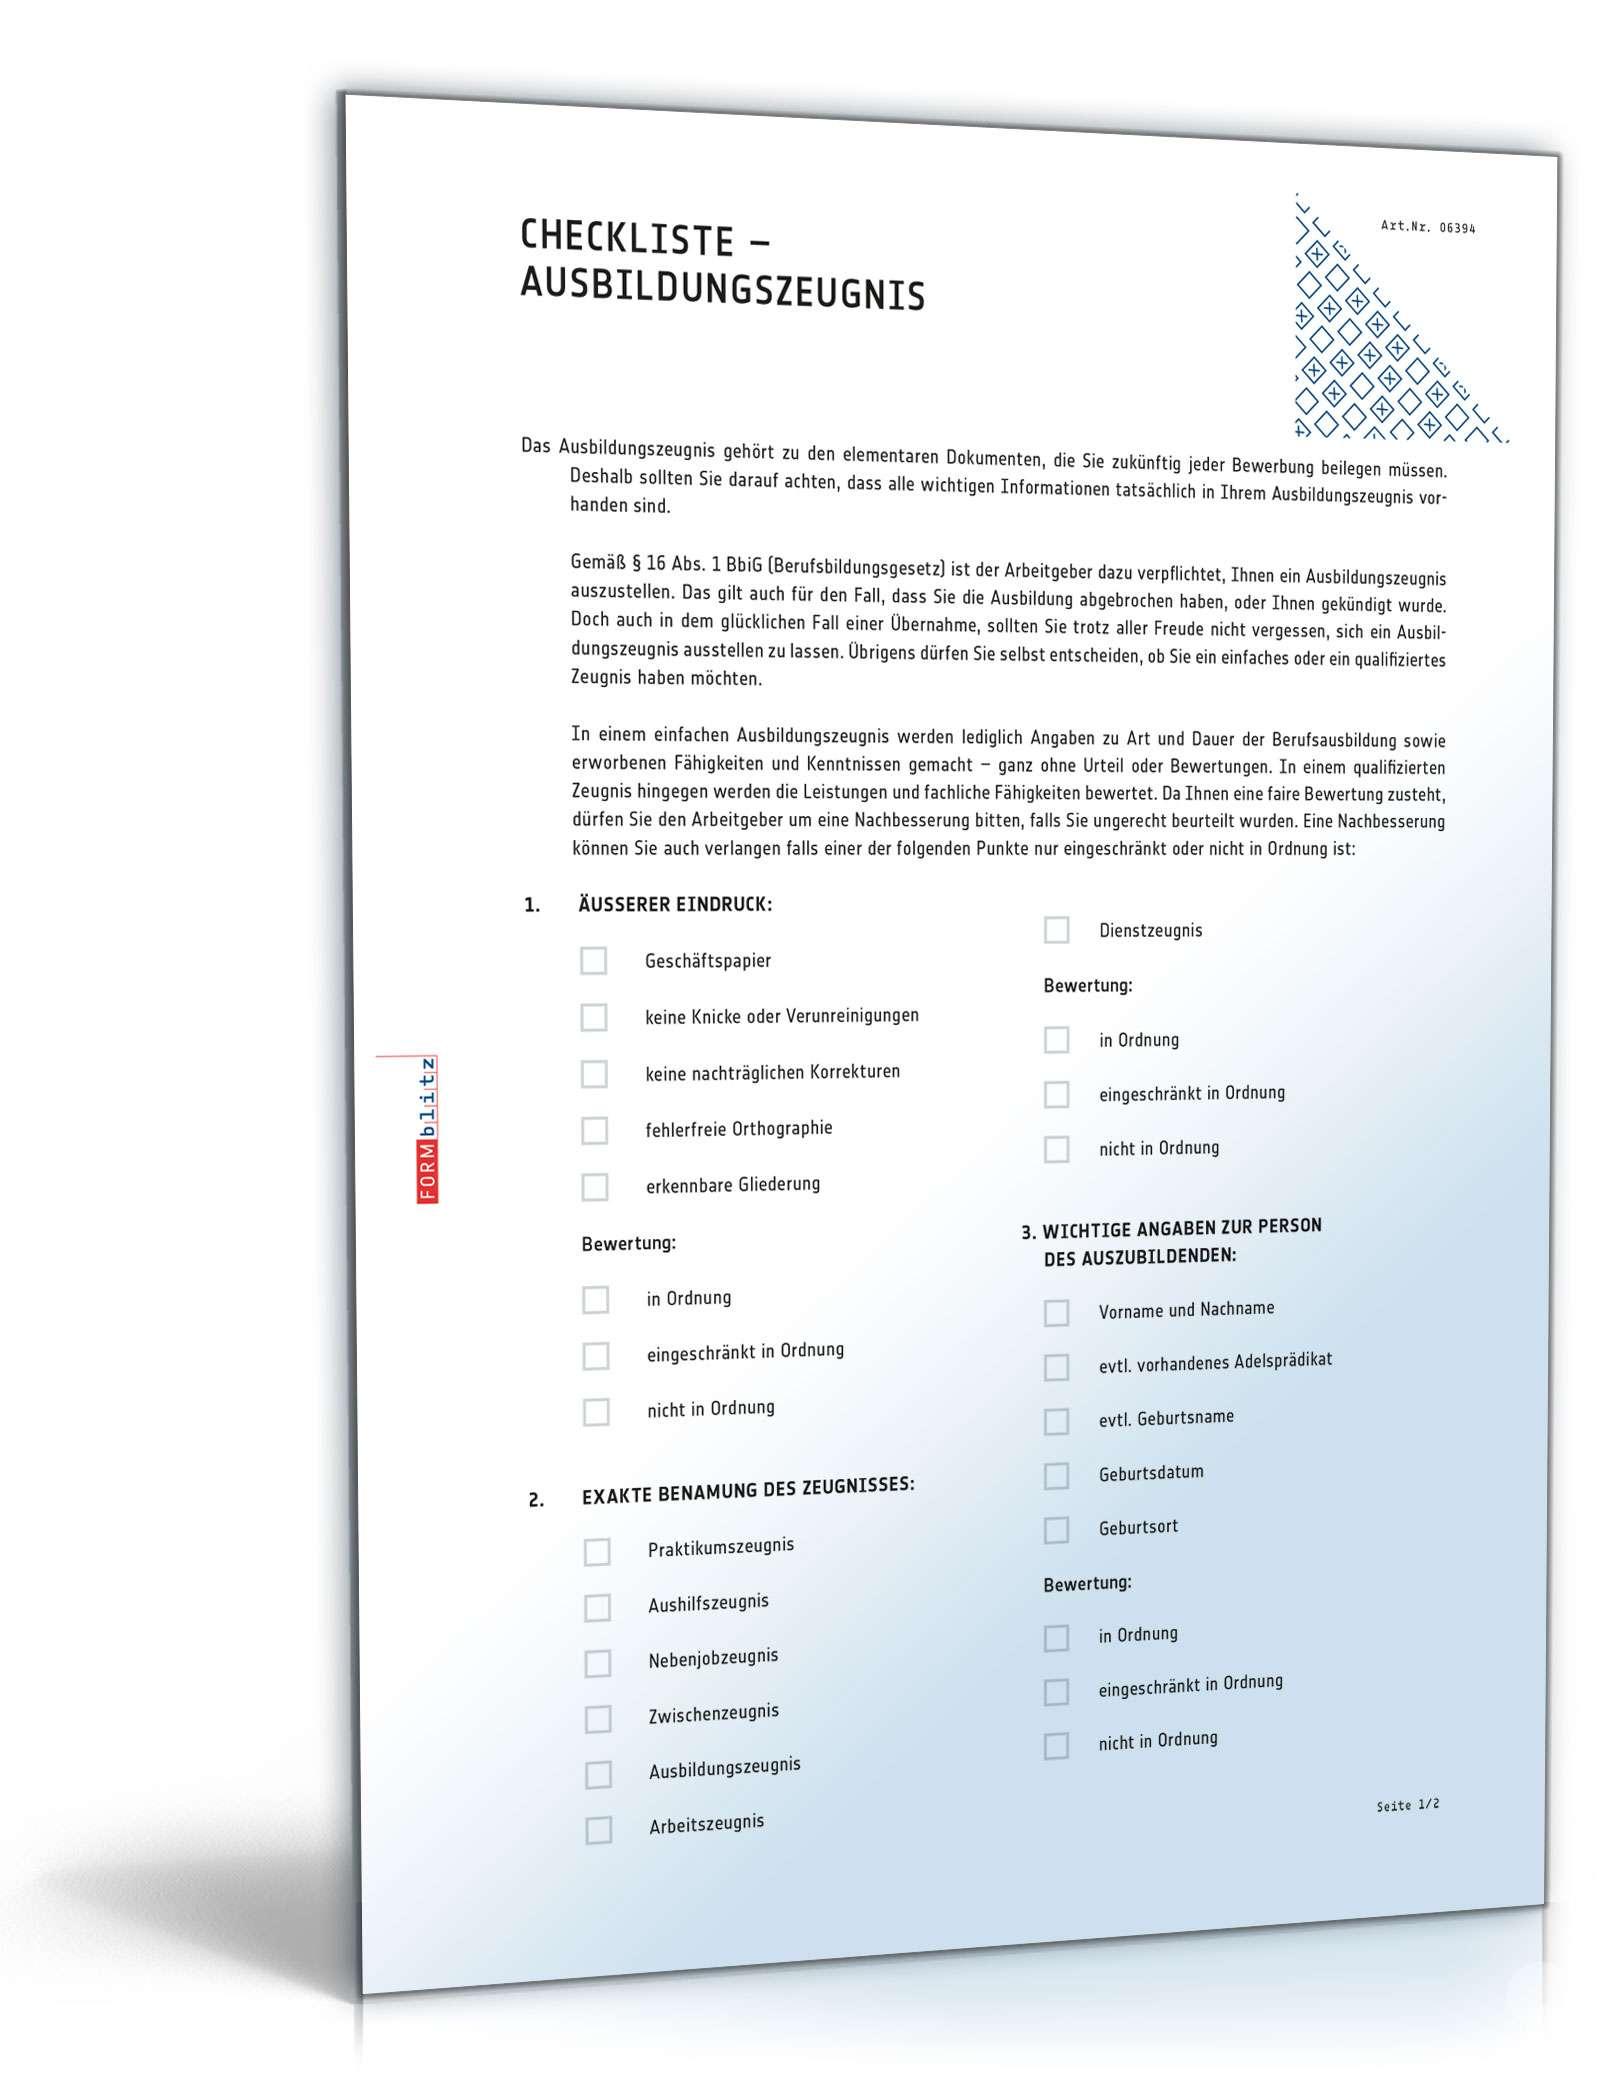 Großzügig Sekretärin Job Lebenslauf Galerie - Entry Level Resume ...